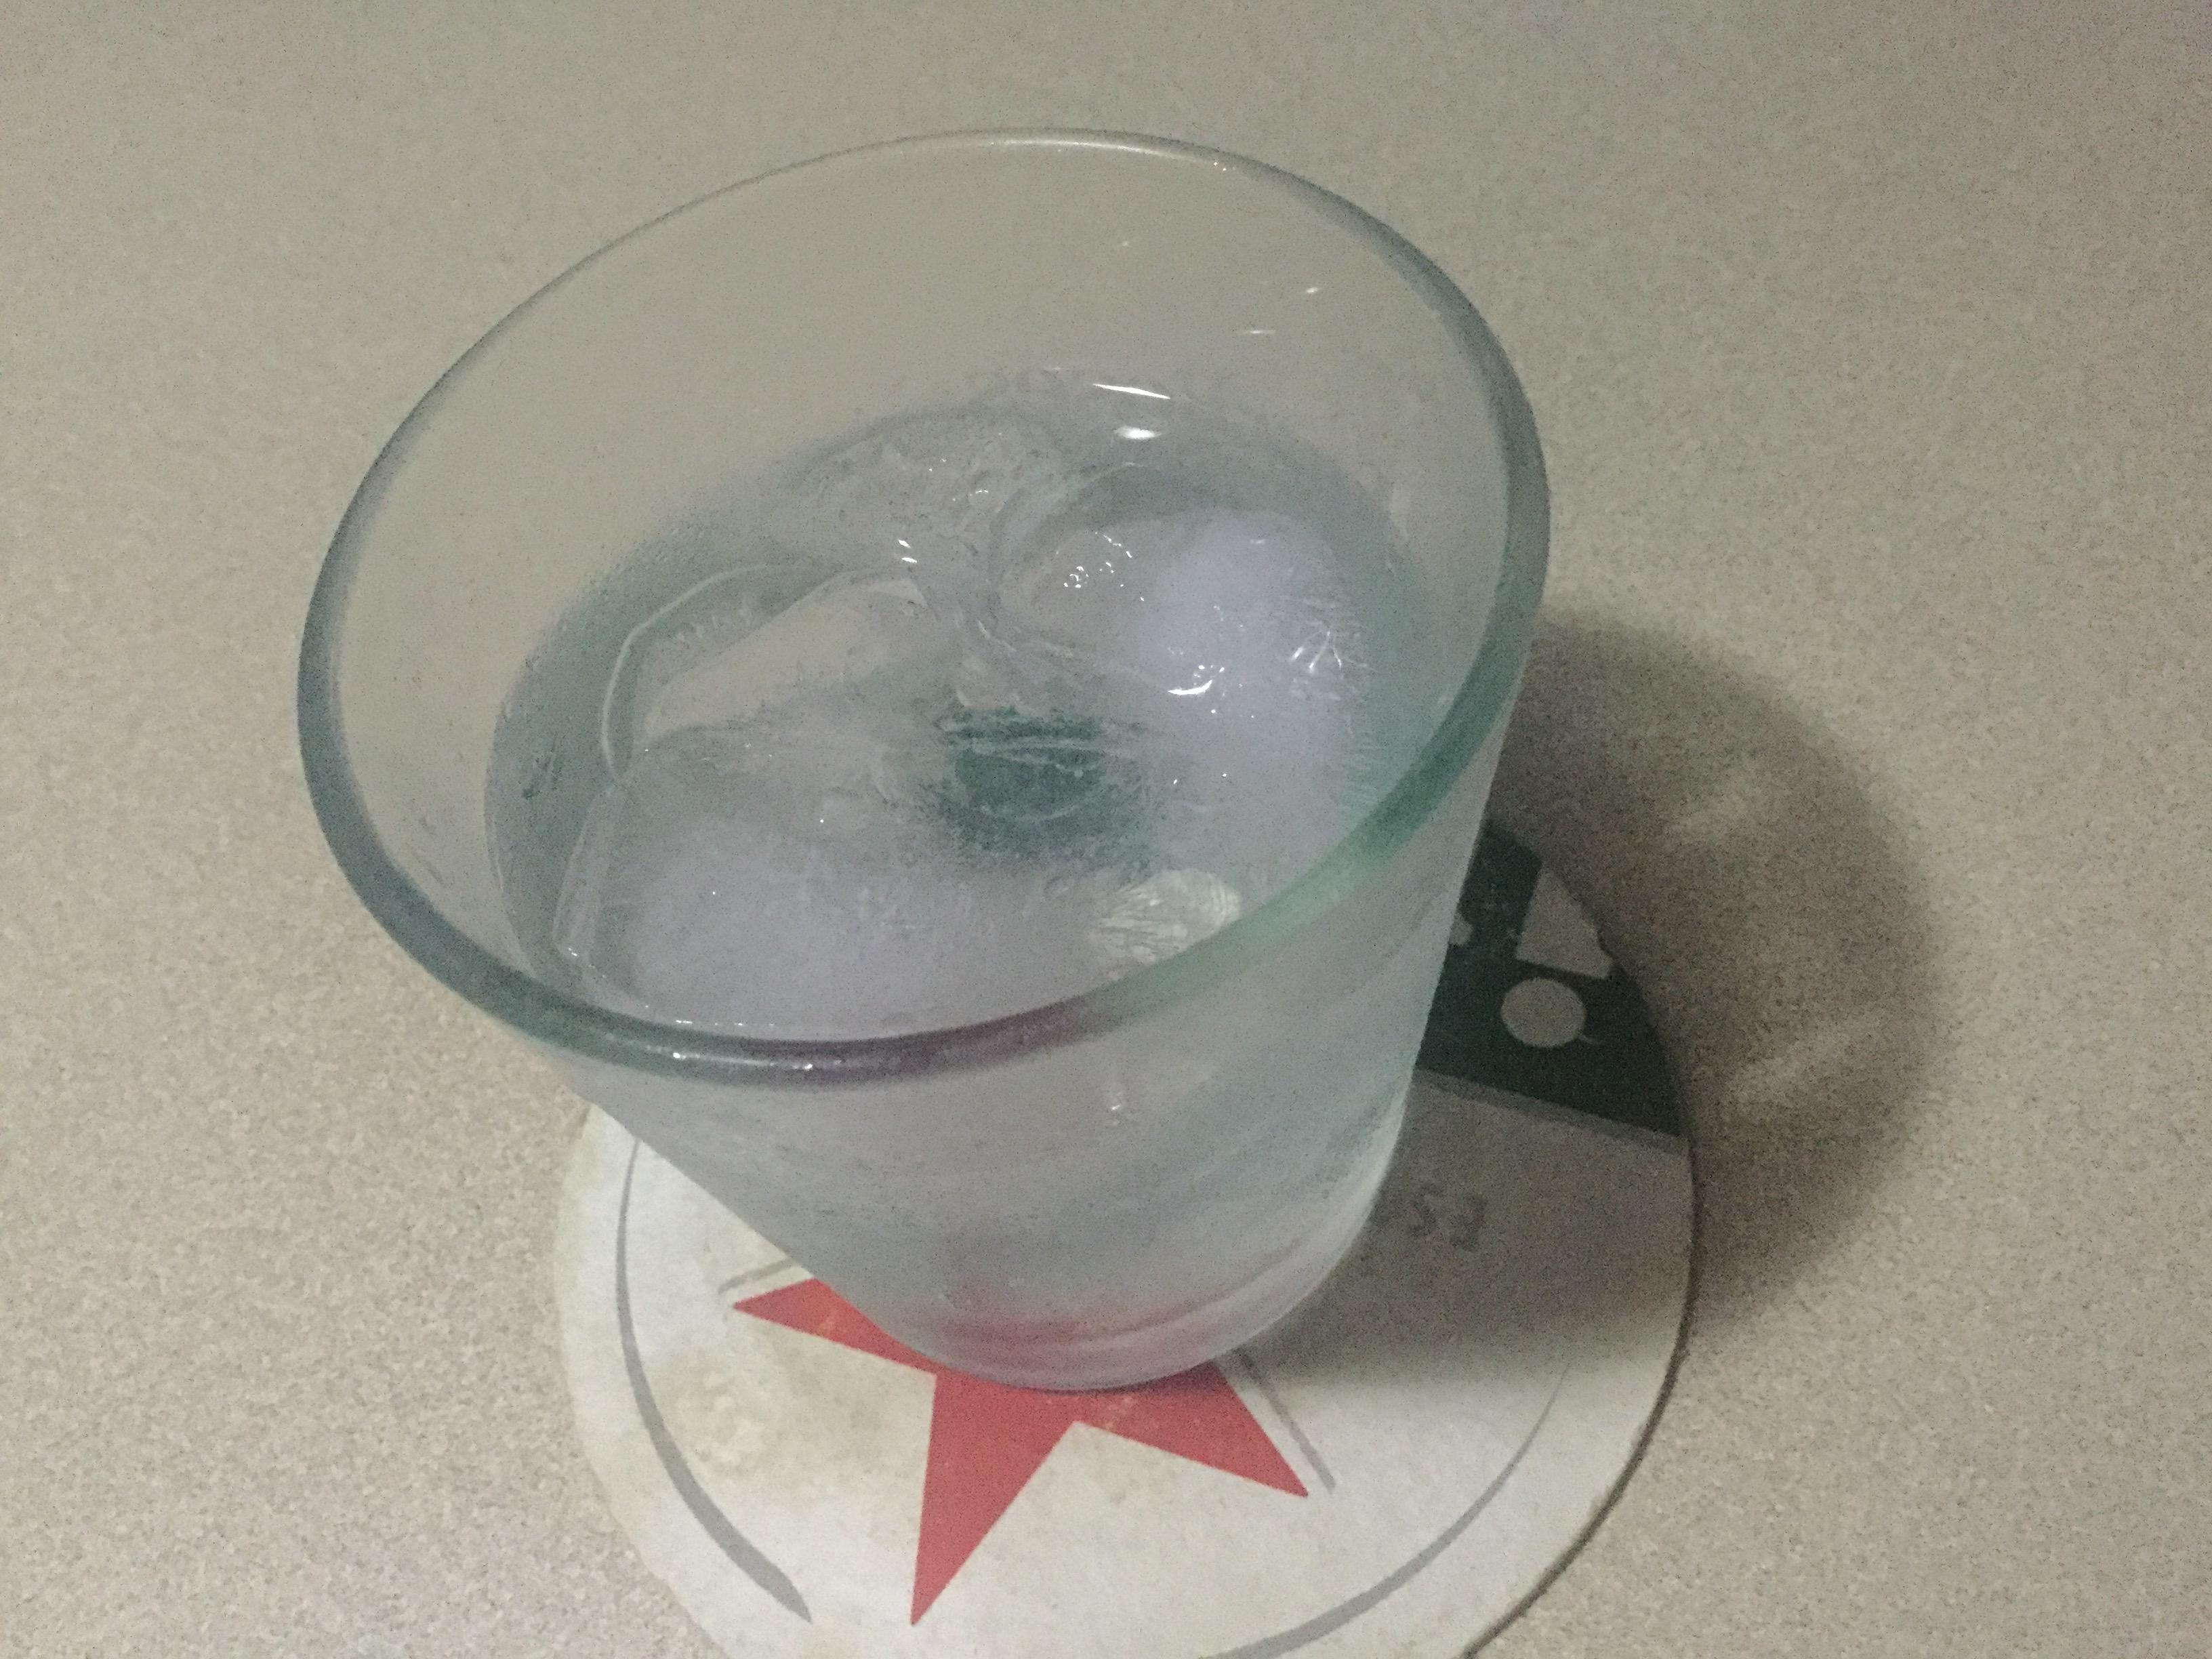 Flying Dutchman Cocktail Joe Azzara